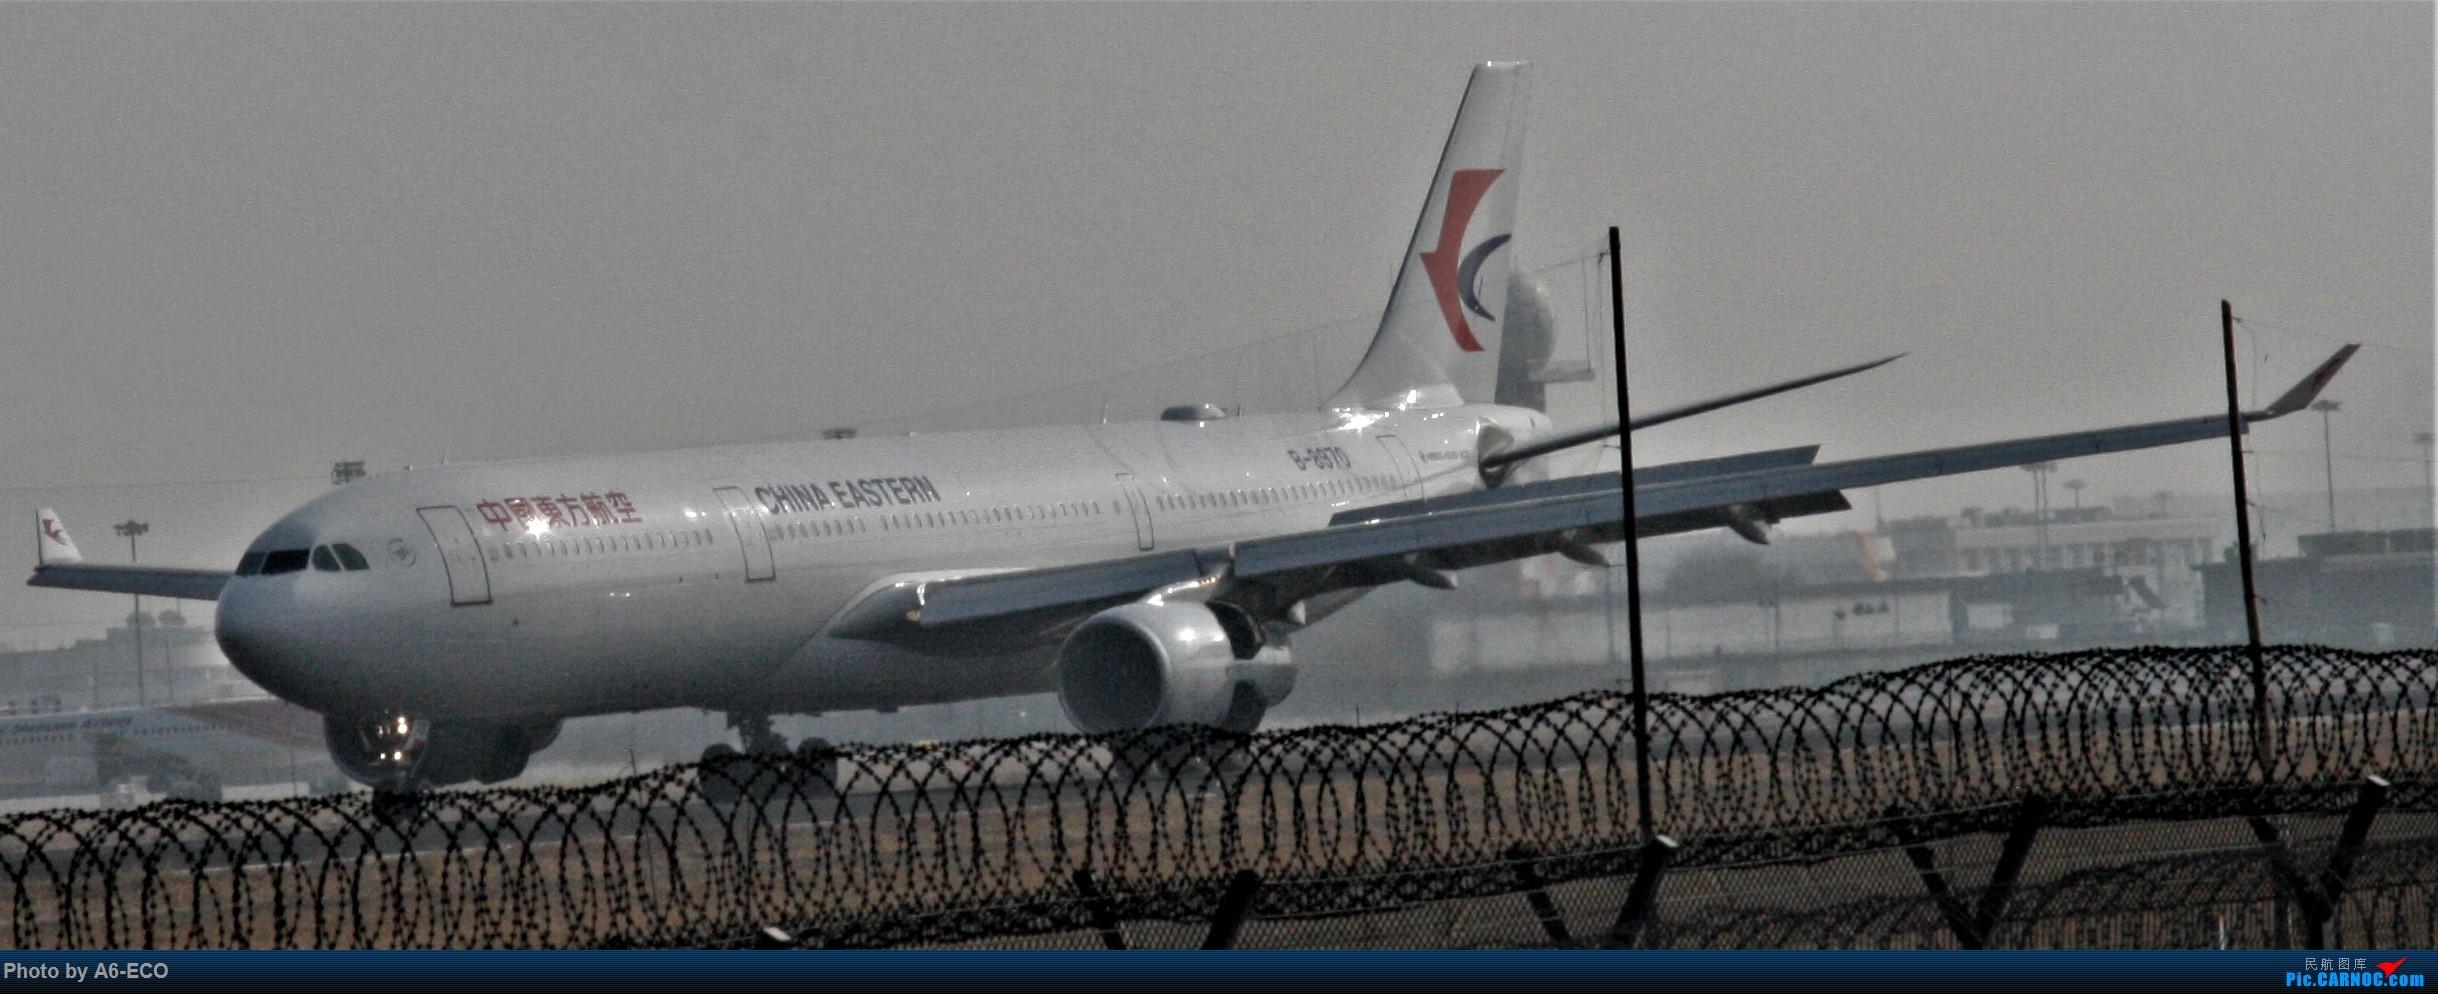 Re:[原创]今天运气极好,云南孔雀,B-1070,2个菜航邮戳,泡菜航彩绘,东航邮戳...... AIRBUS A330-300 B-8970 中国北京首都国际机场